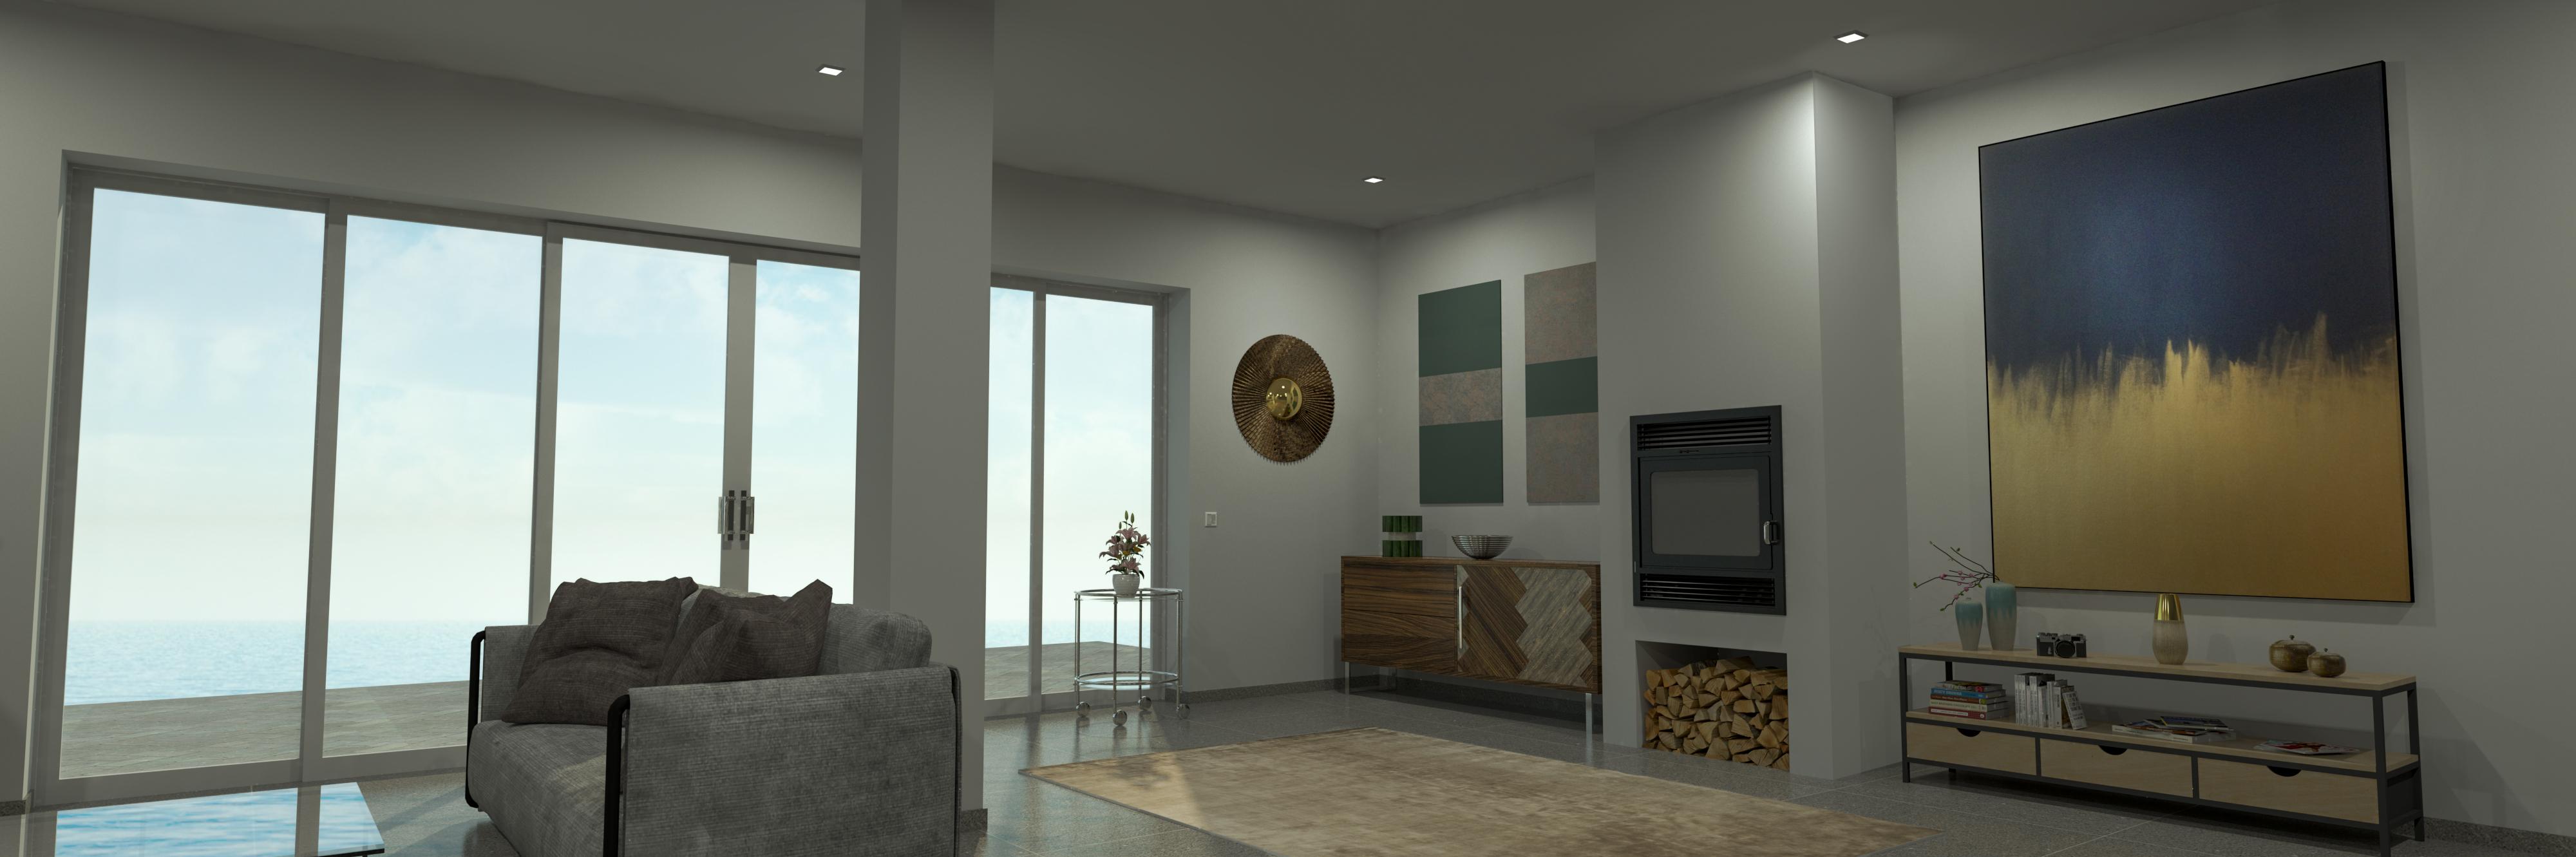 Livingroom_120118